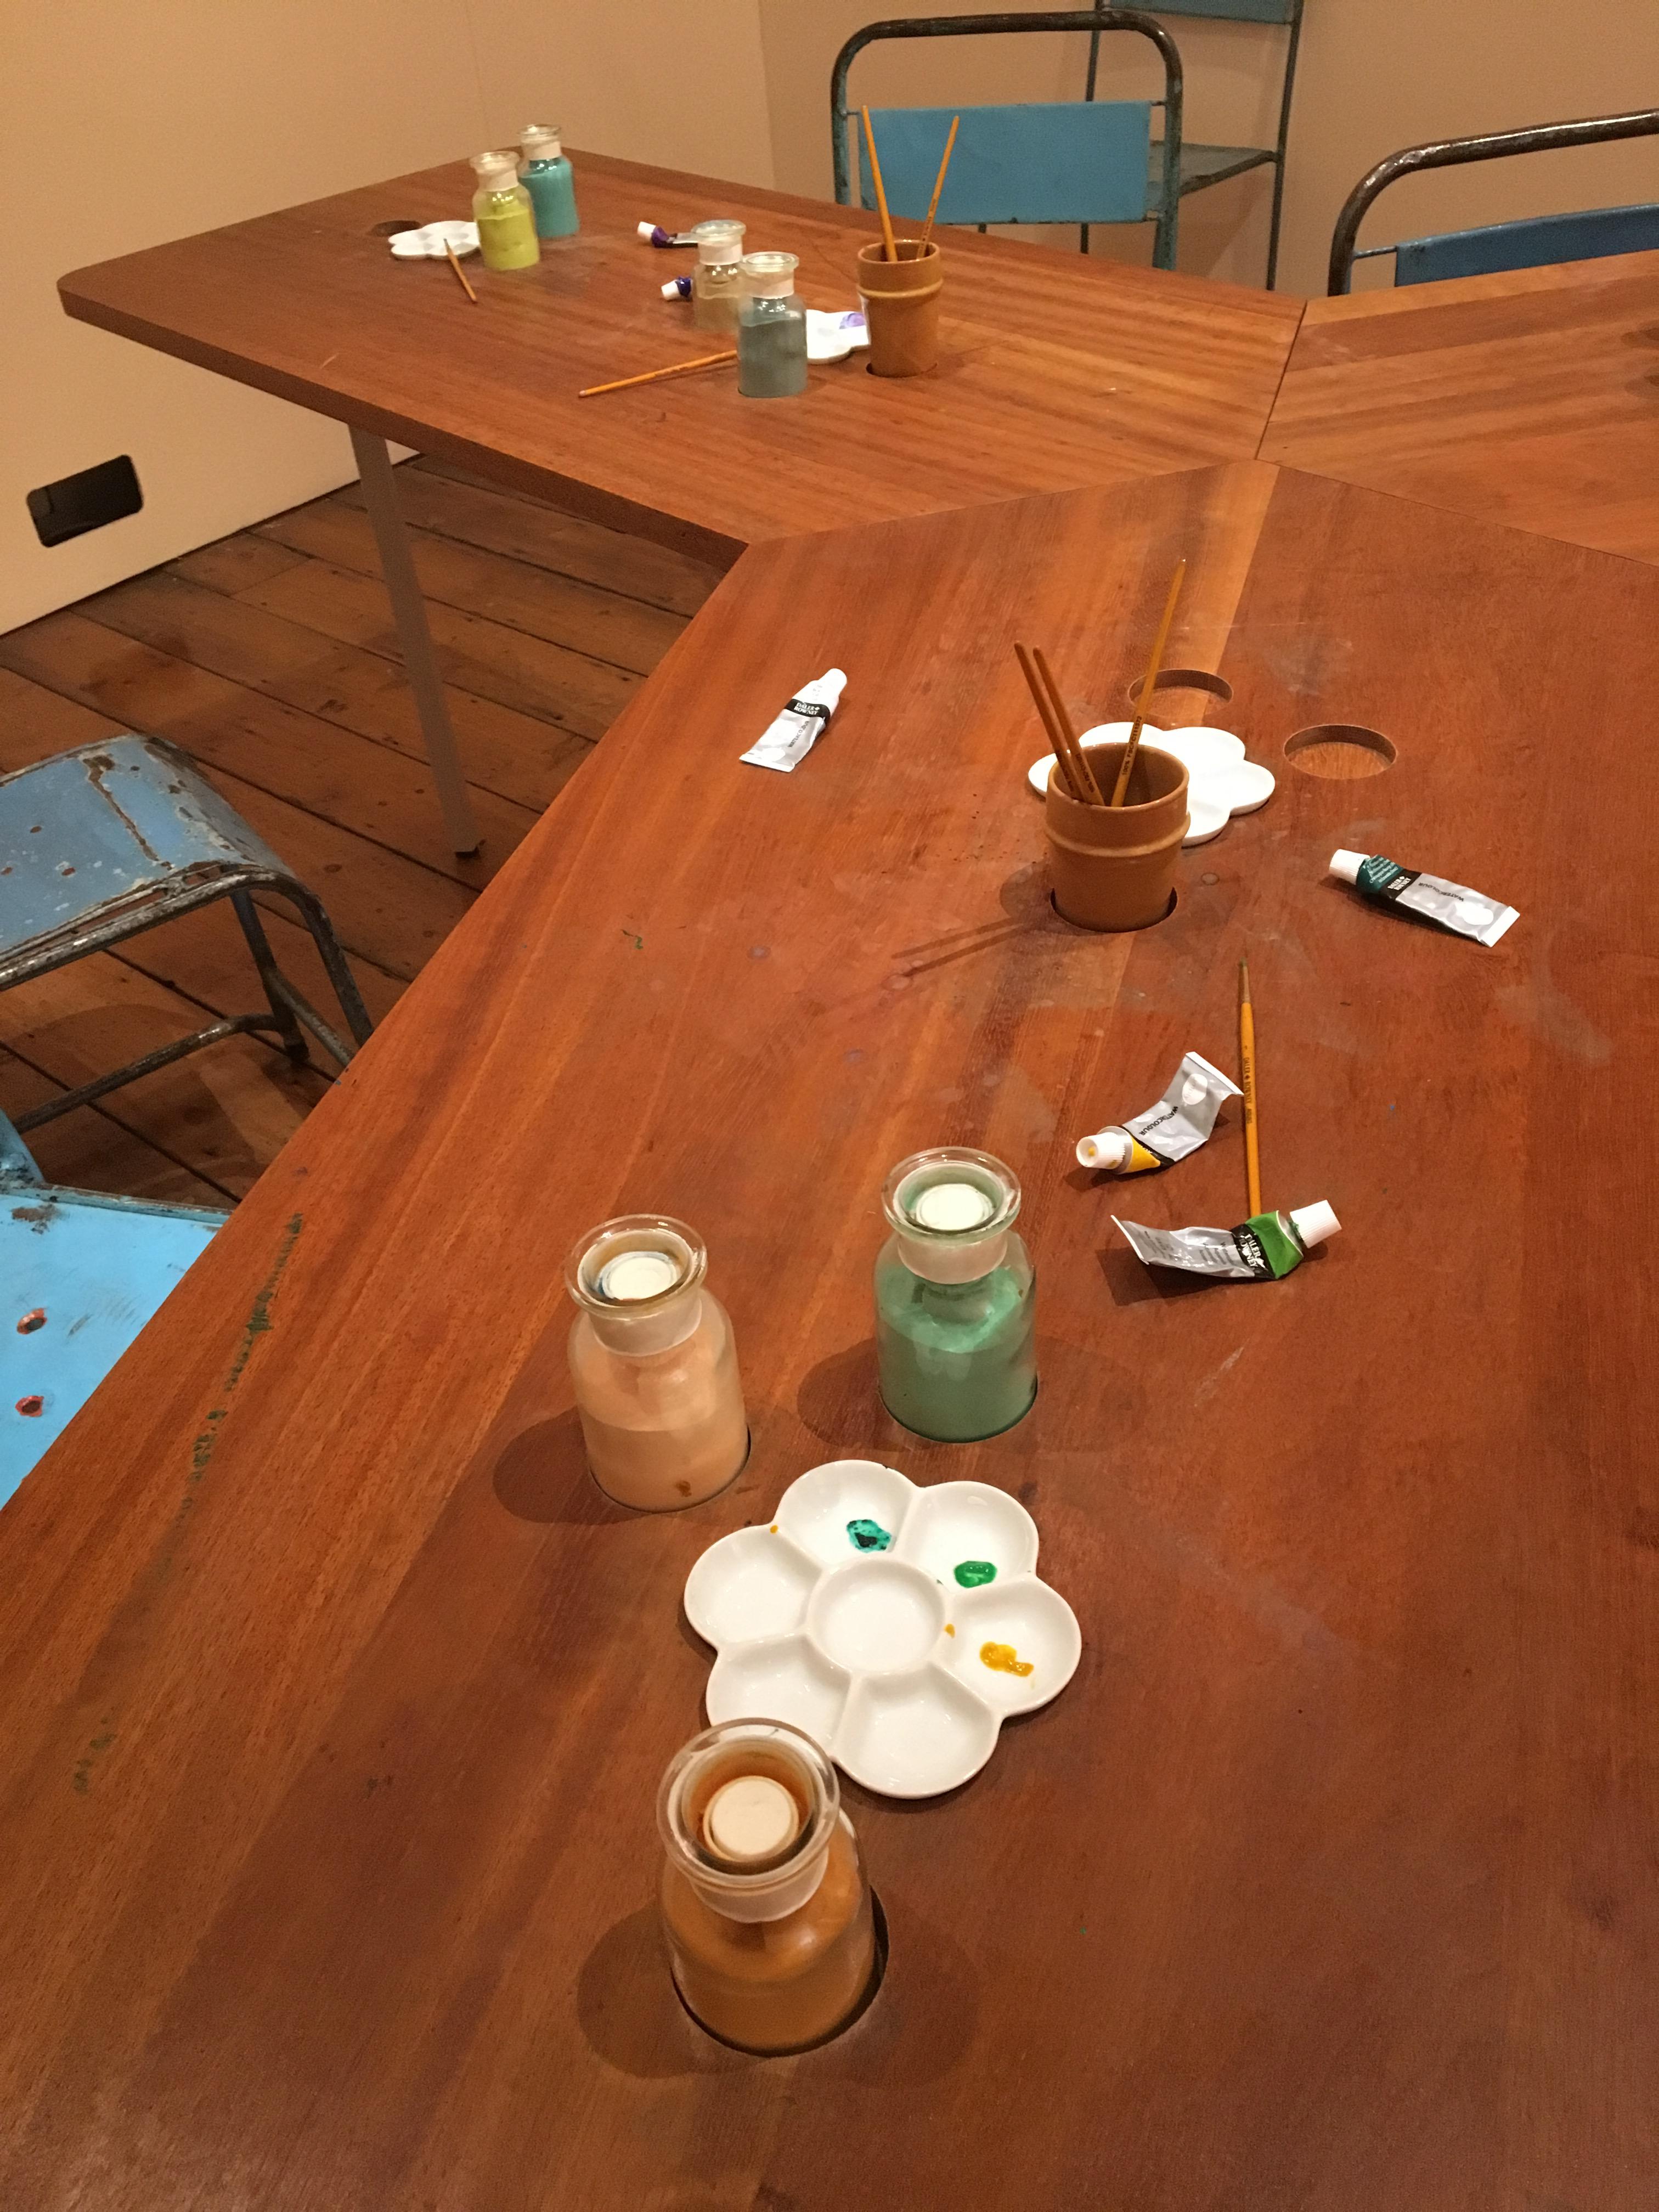 Perfume, somerset house, July 2017 5